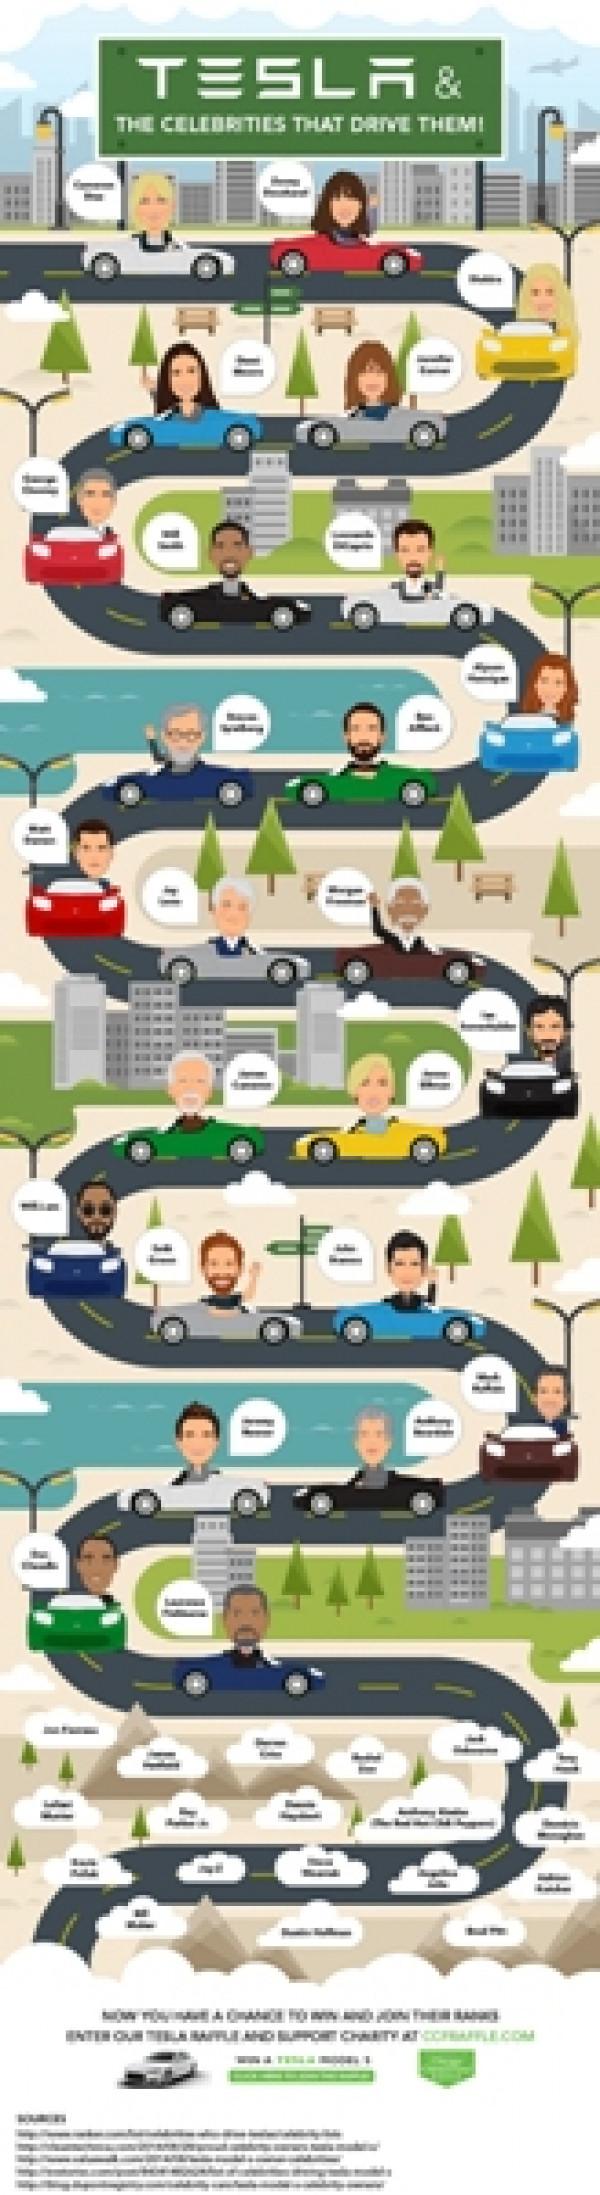 Tesla Infographic